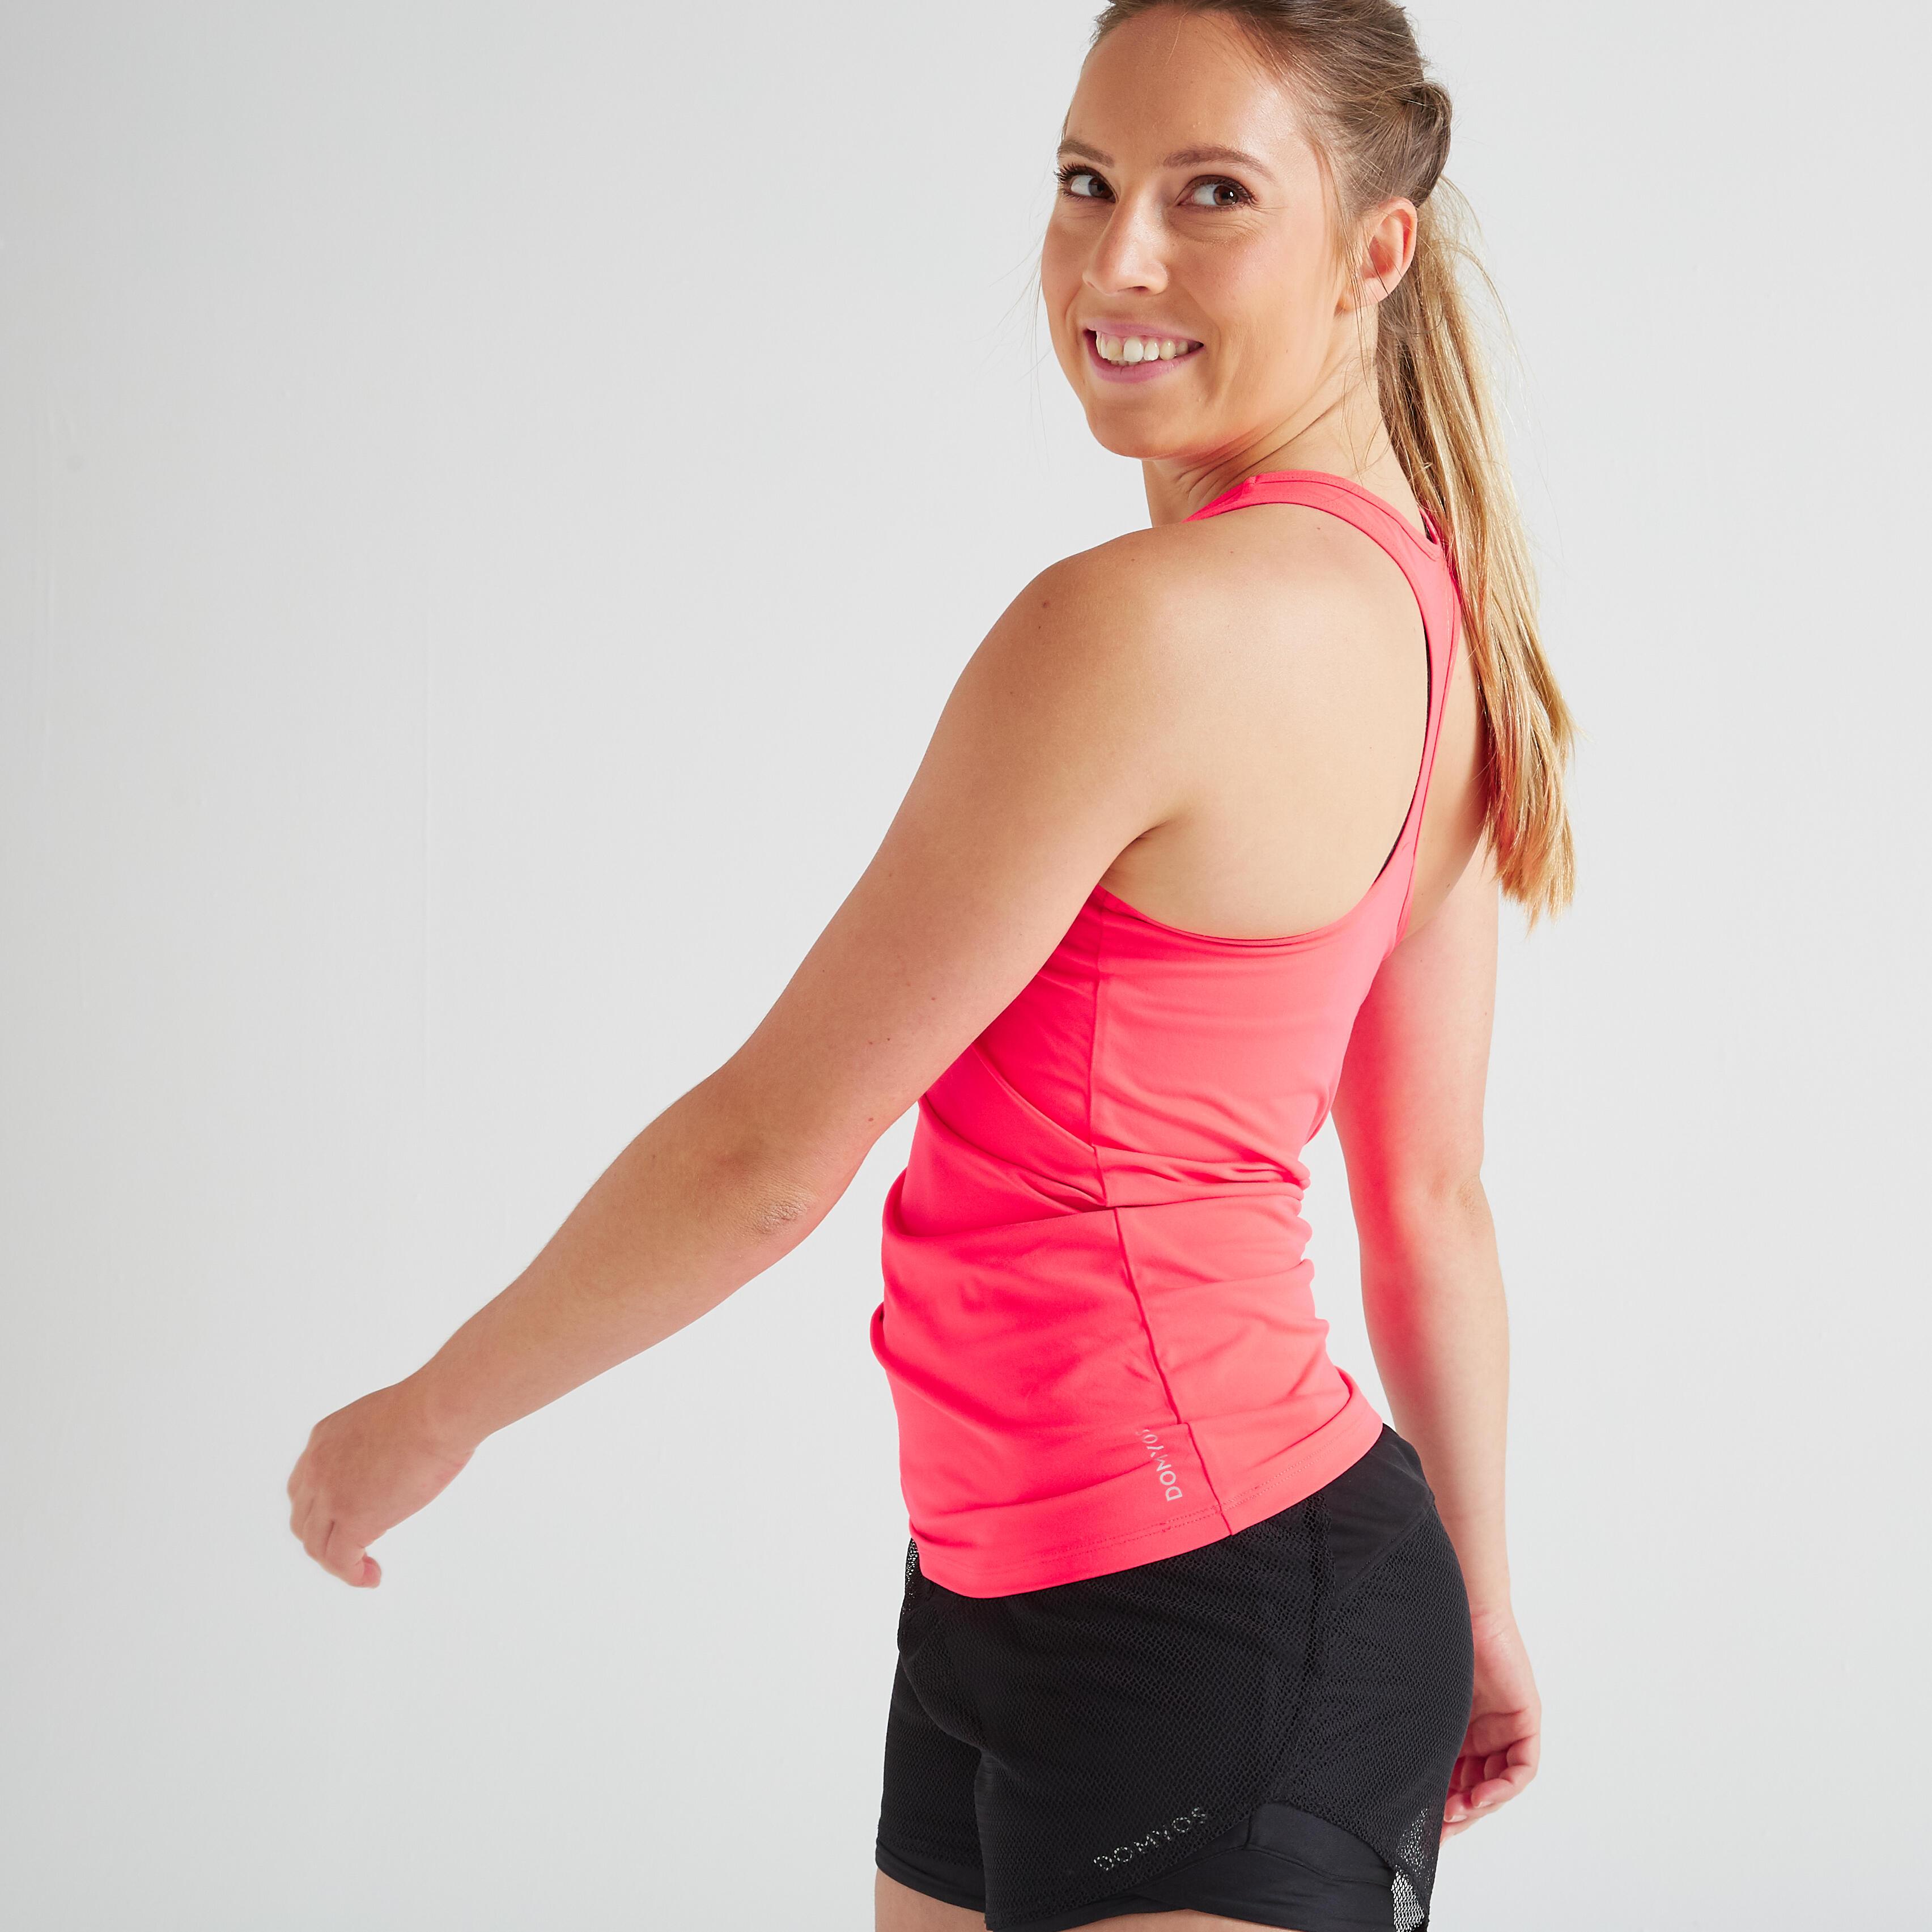 My Top 100 Fitness Cardio Damen rosa | Sportbekleidung > Sporttops > Trainingstops | Rot - Rosa | Domyos